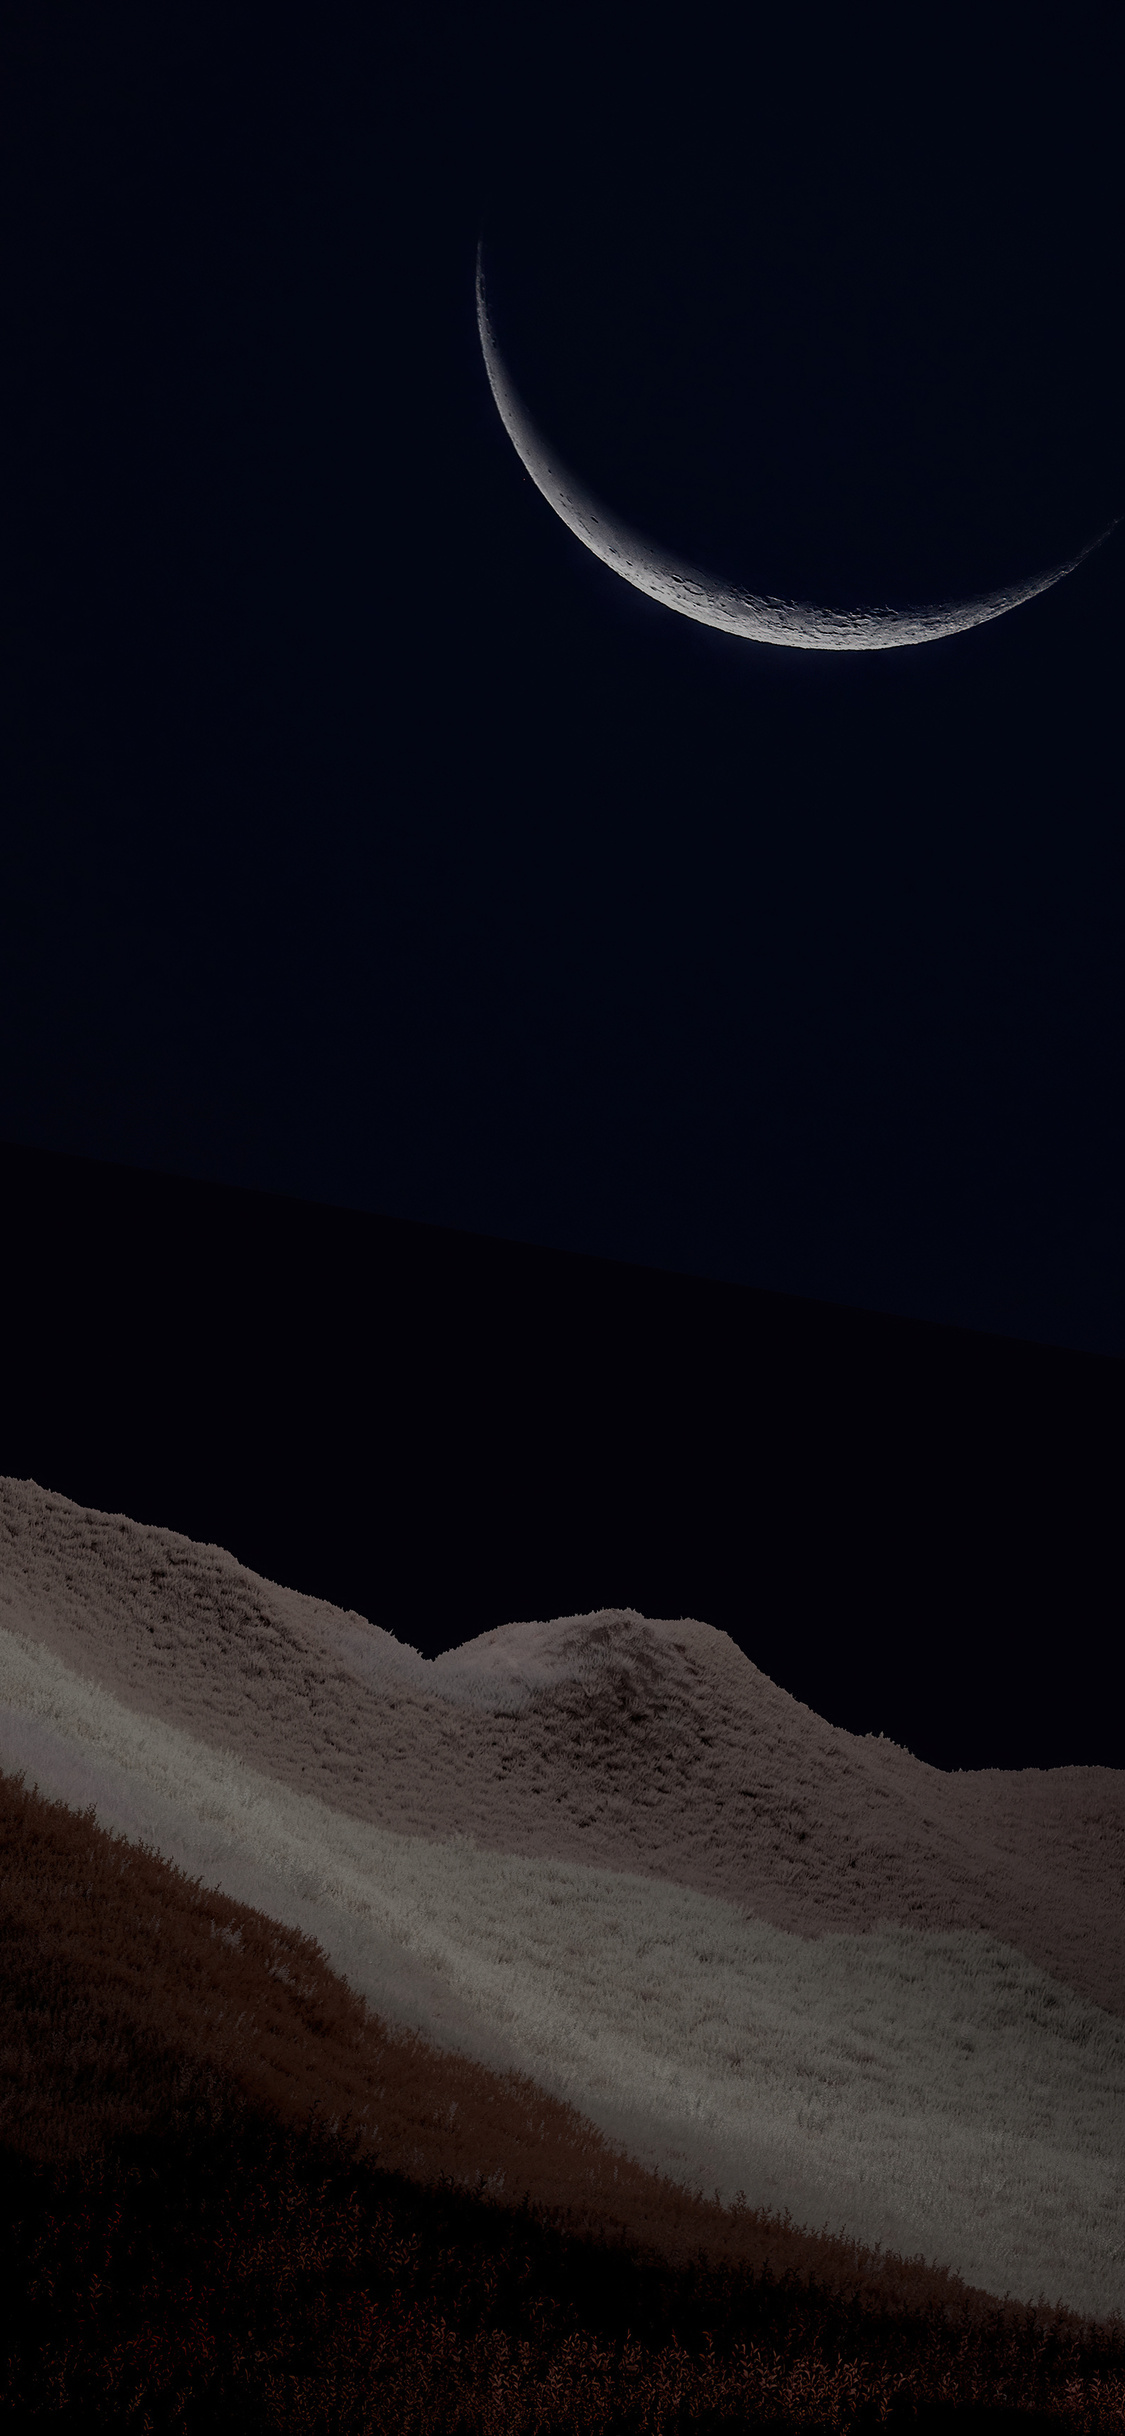 surface-pro-7-night-5k-5q.jpg